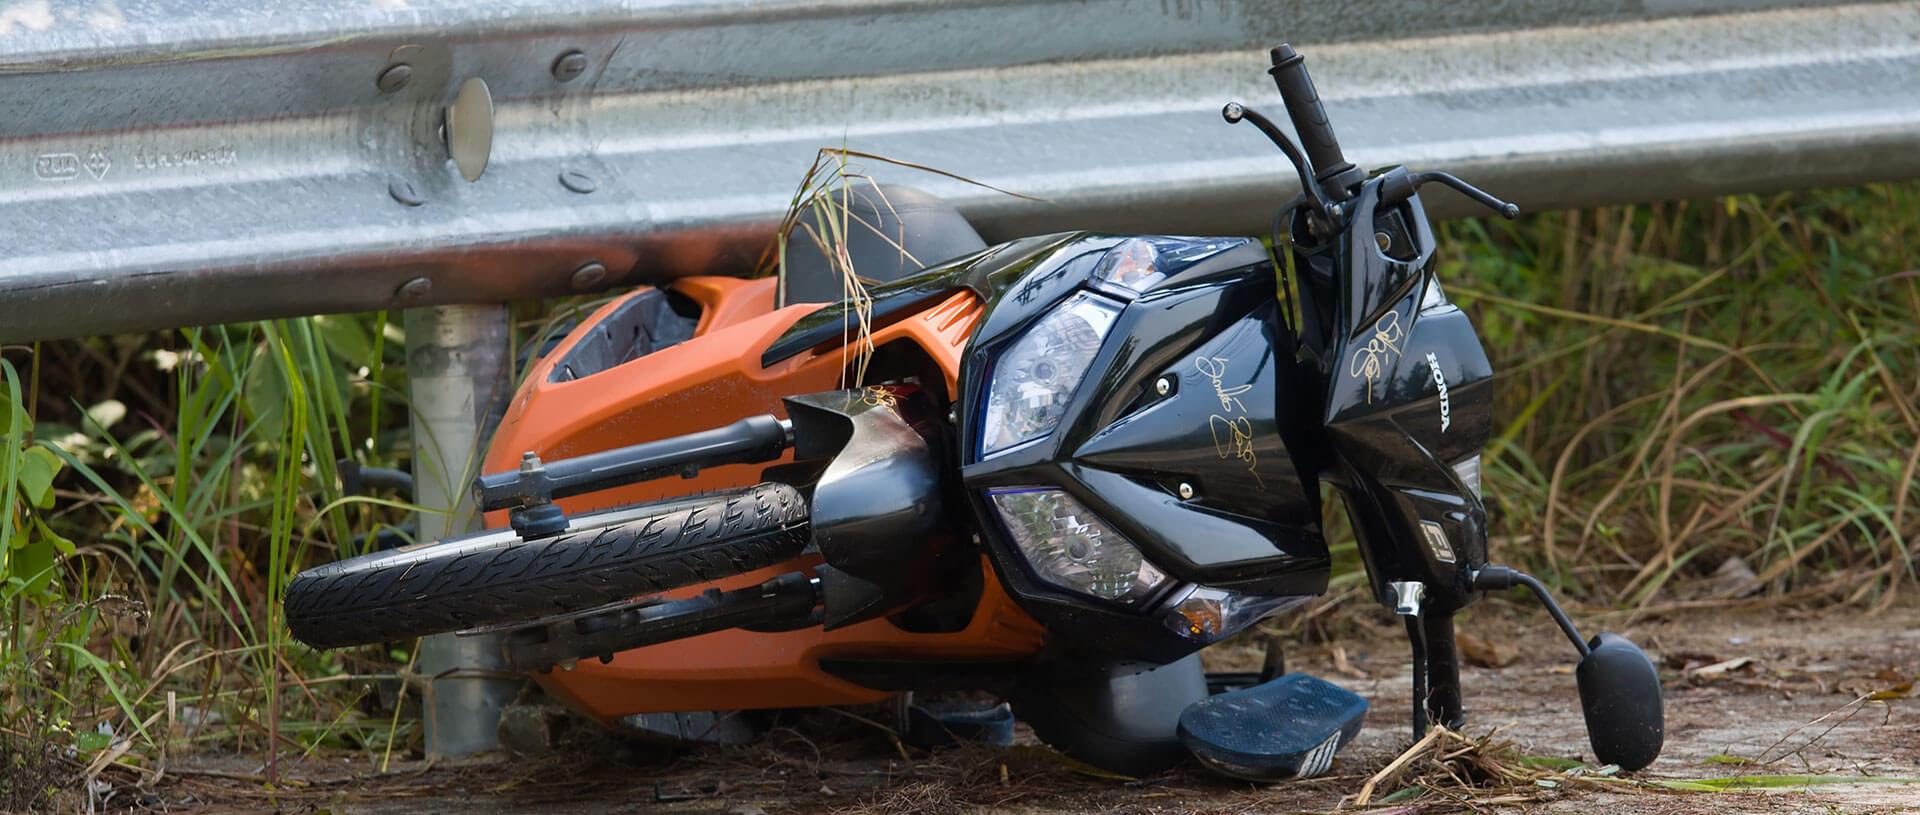 Motorcycle Accident Lawyer Central Phoenix AZ   Injury Lawyers